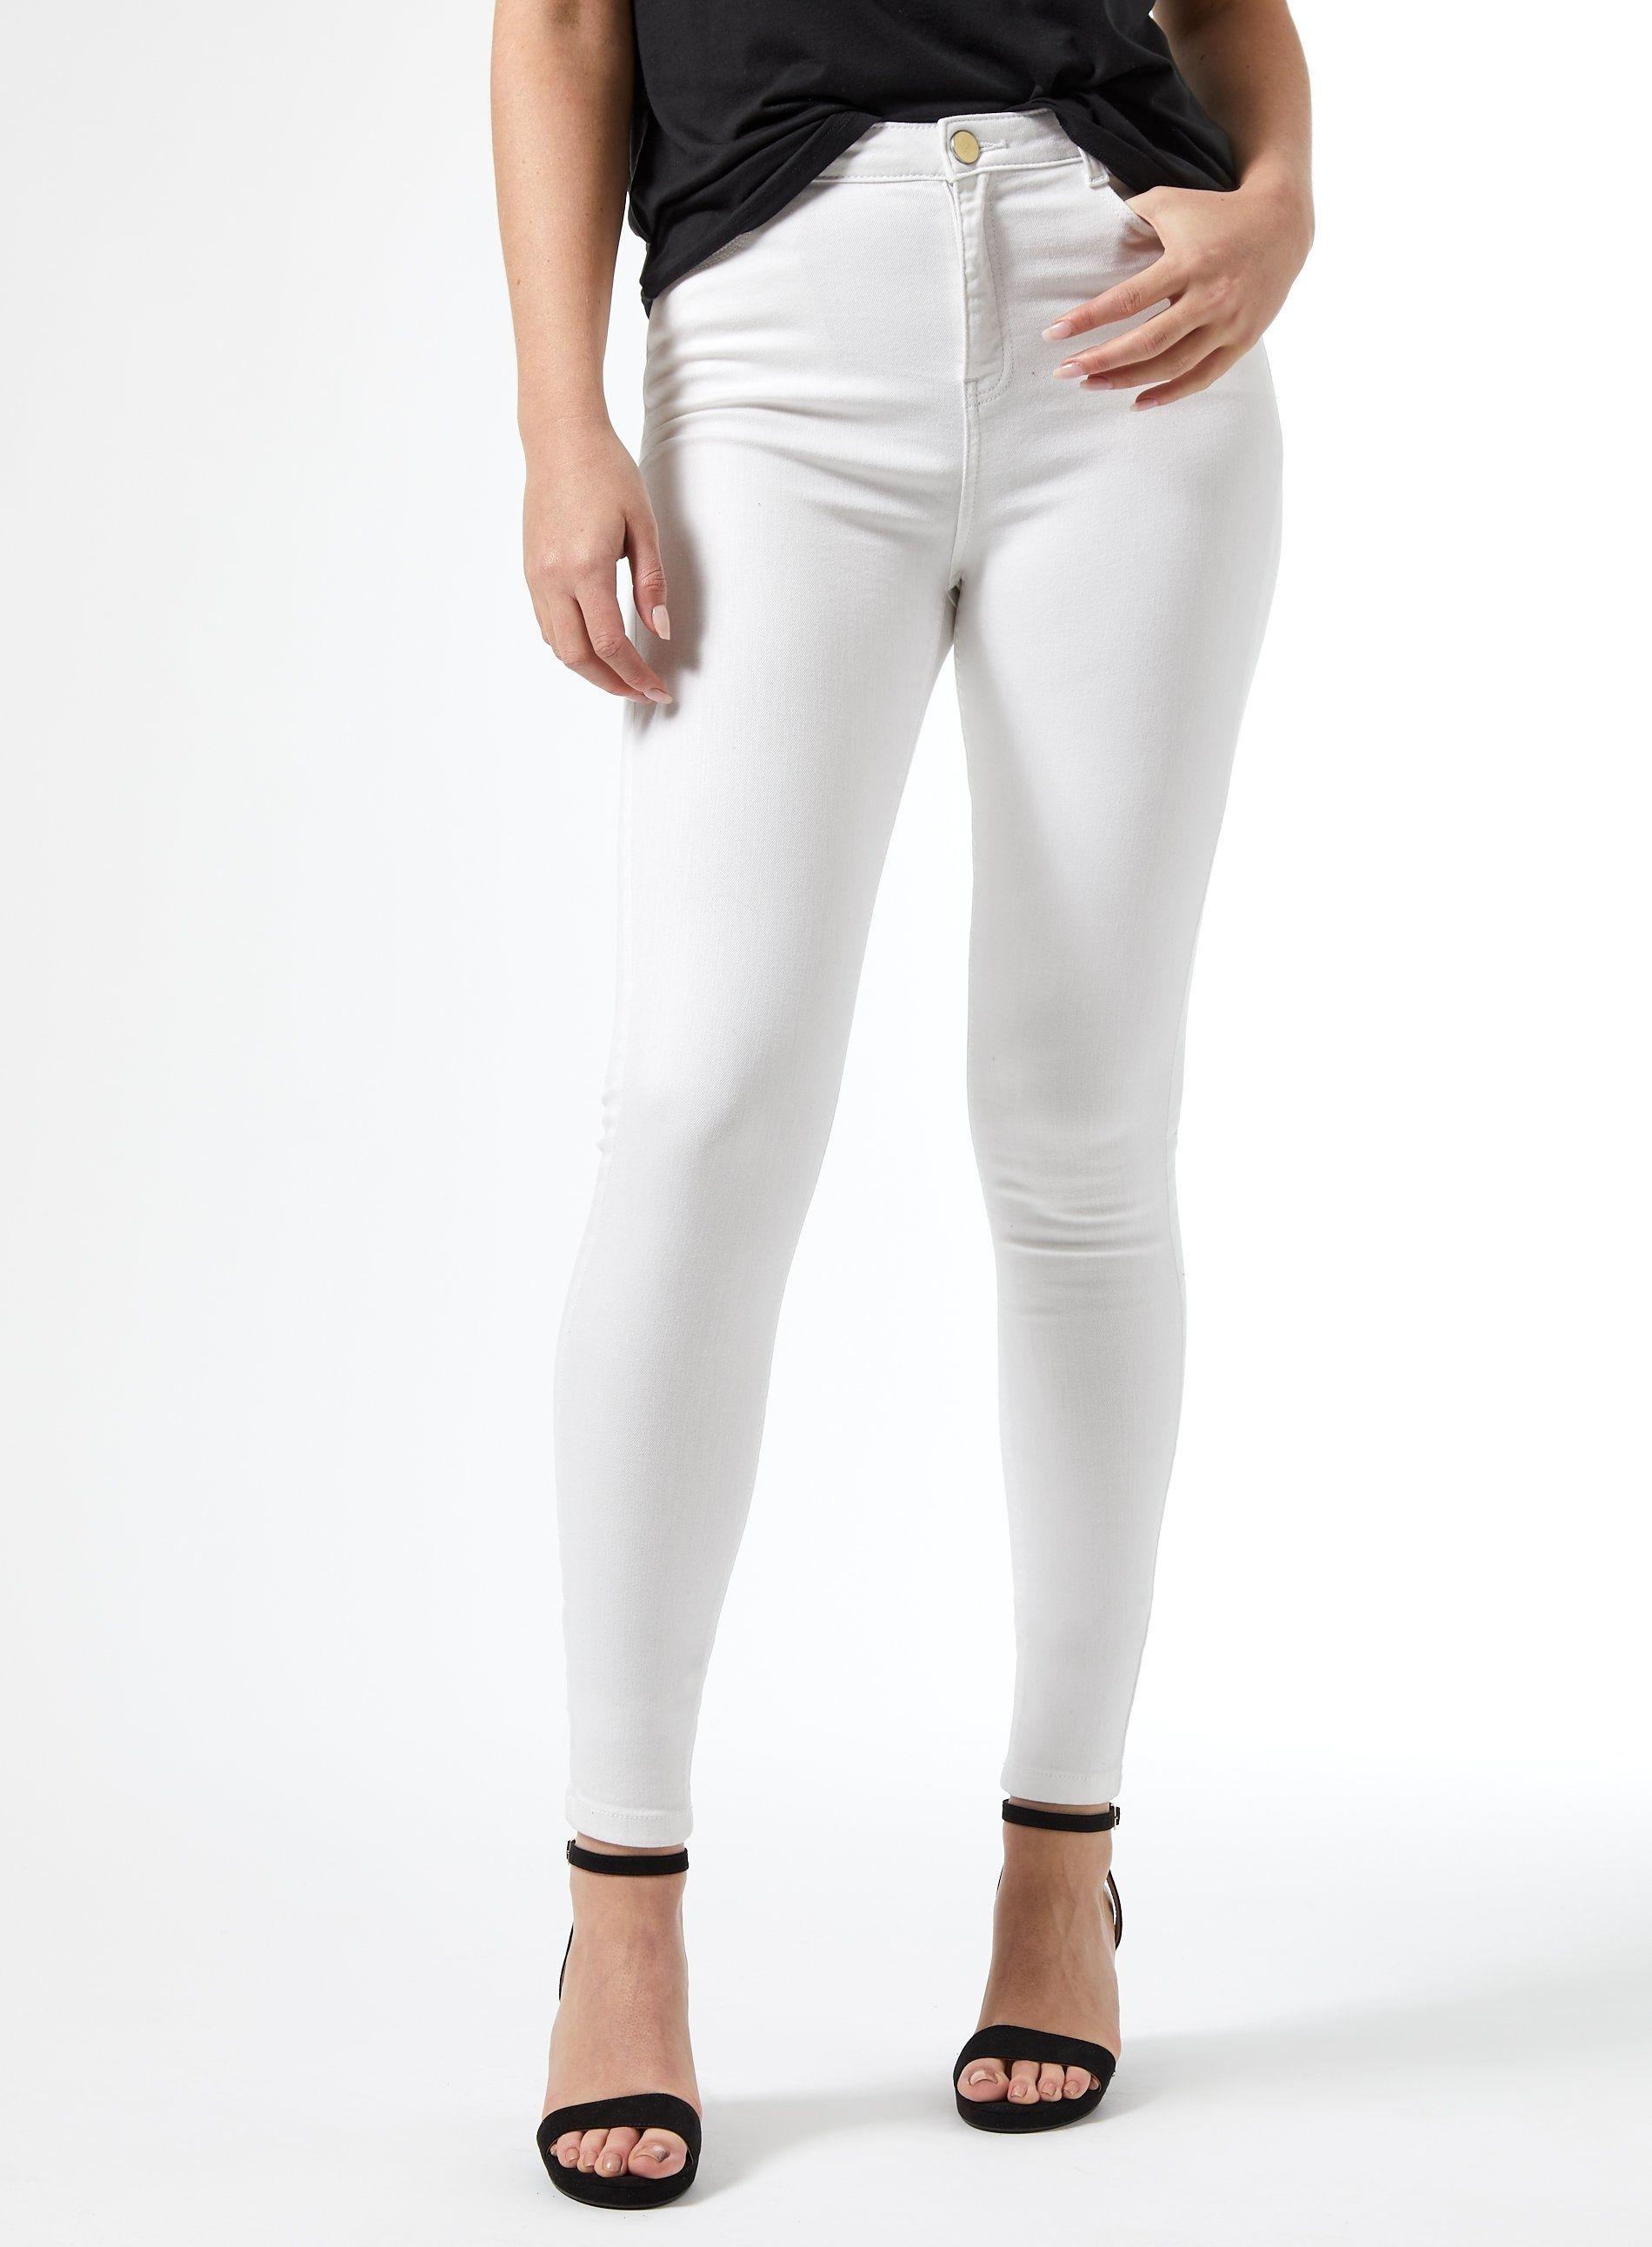 Dorothy Perkins Womens Tall White Shape & Lift Denim Skinny Jeans Pants Trousers